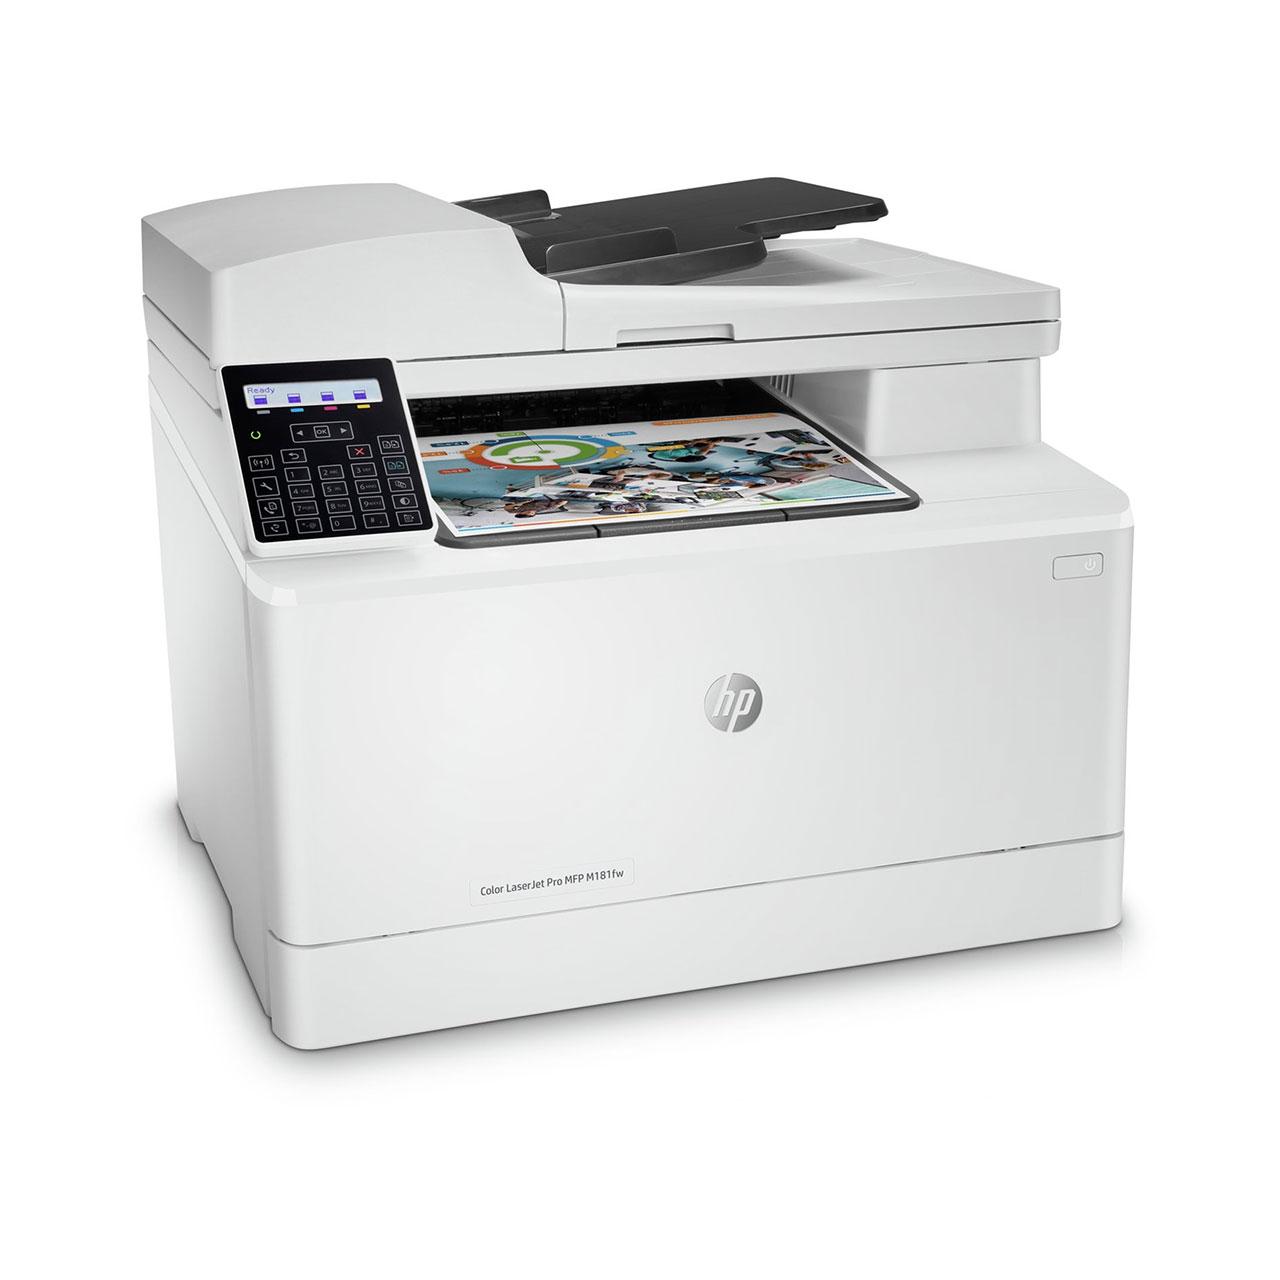 HP Color LaserJet Pro MFP M181fw toner